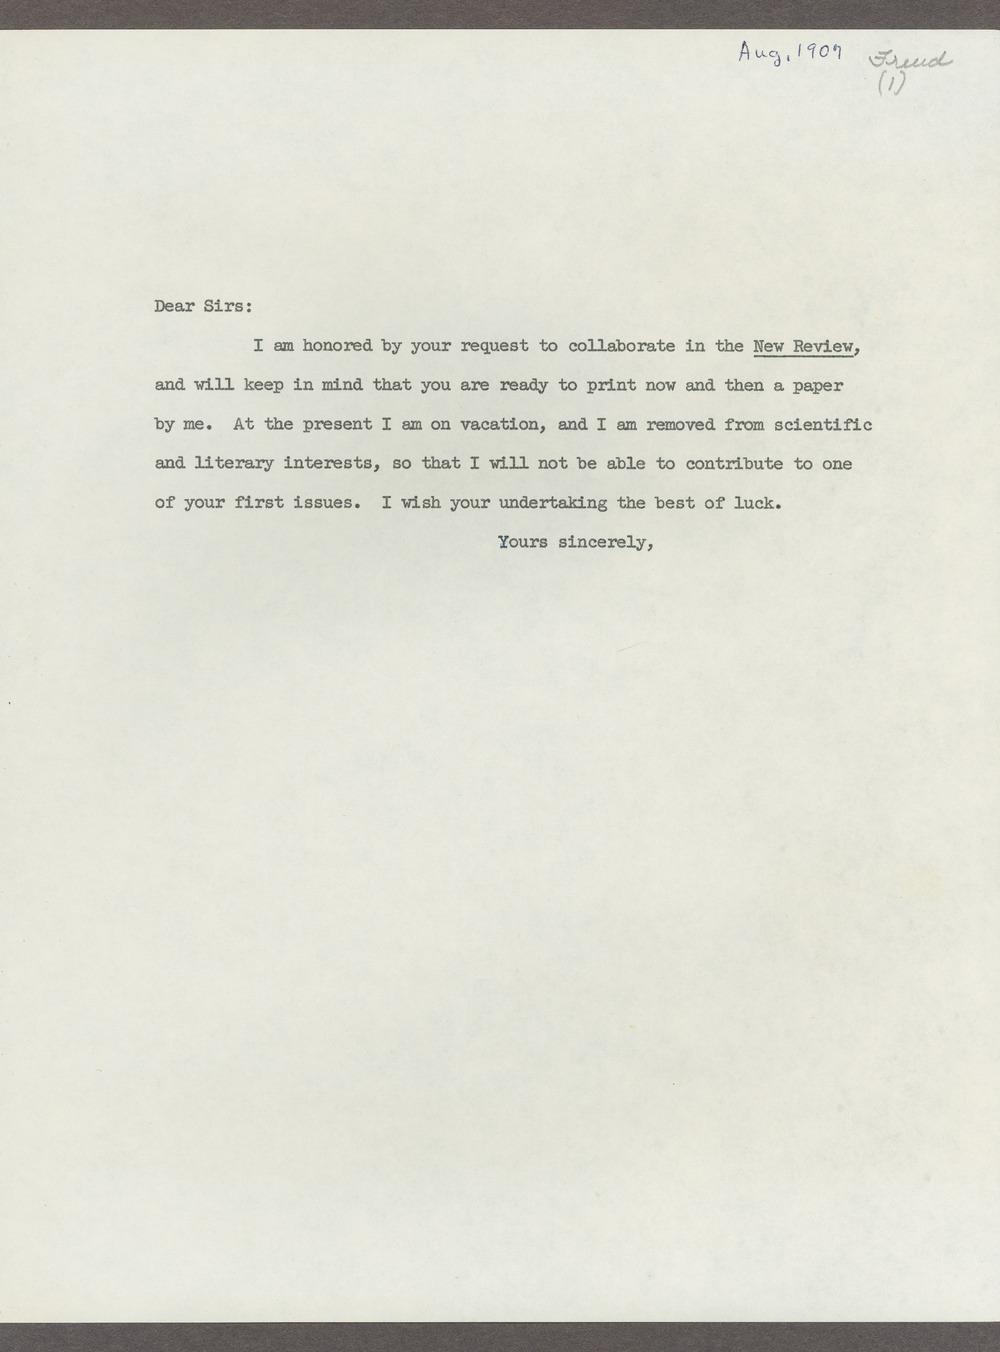 Sigmund Freud correspondence - 3